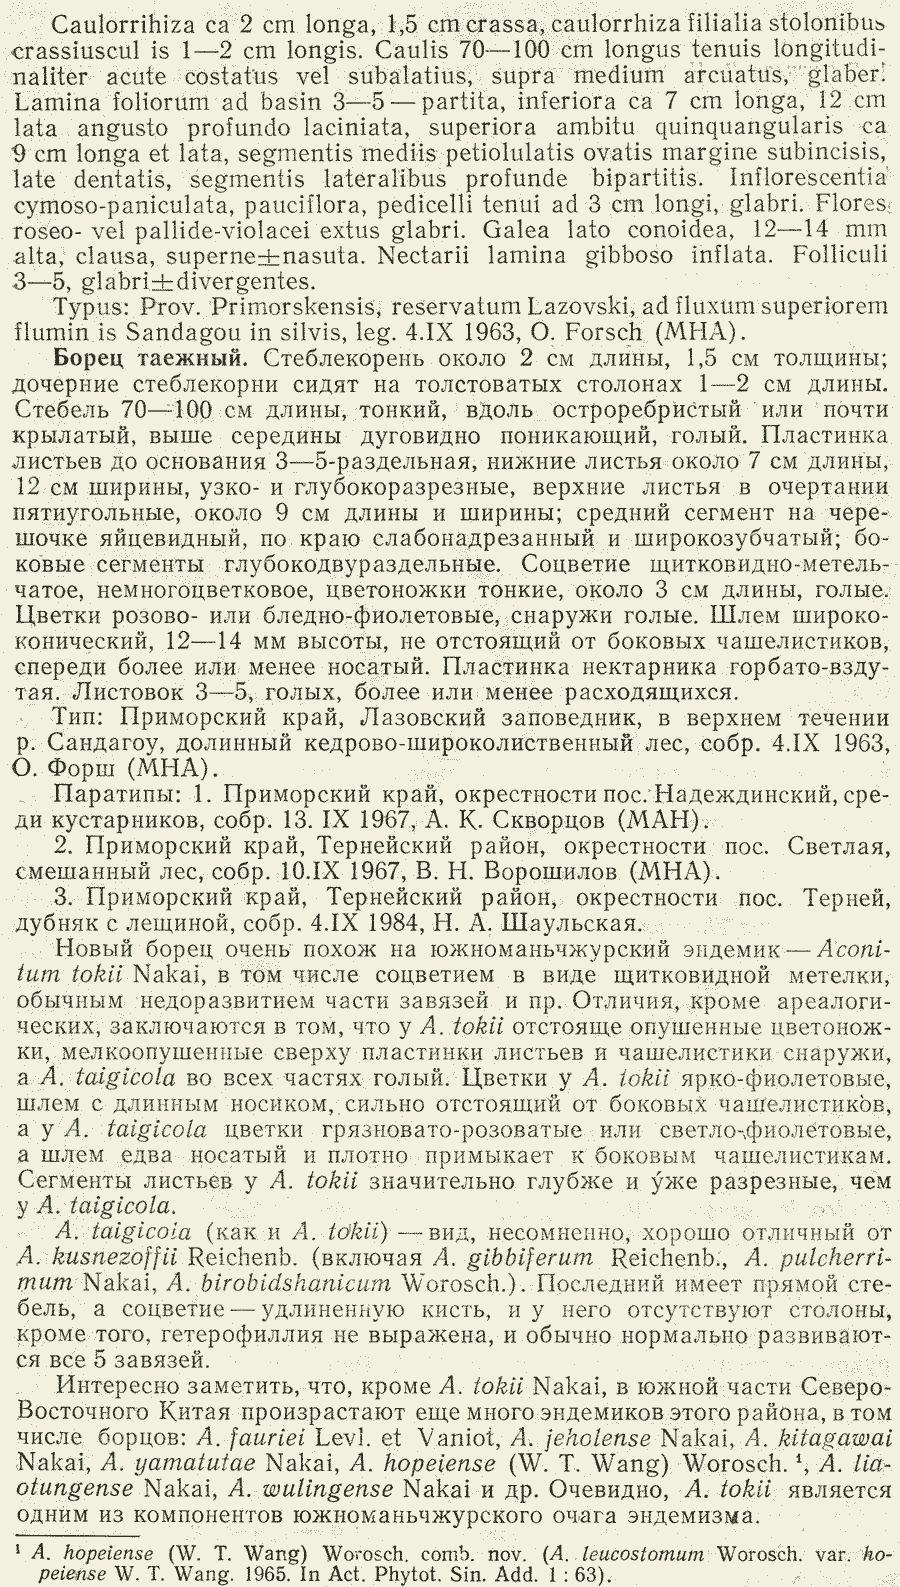 http://forum.plantarium.ru/misc.php?action=pun_attachment&item=19570